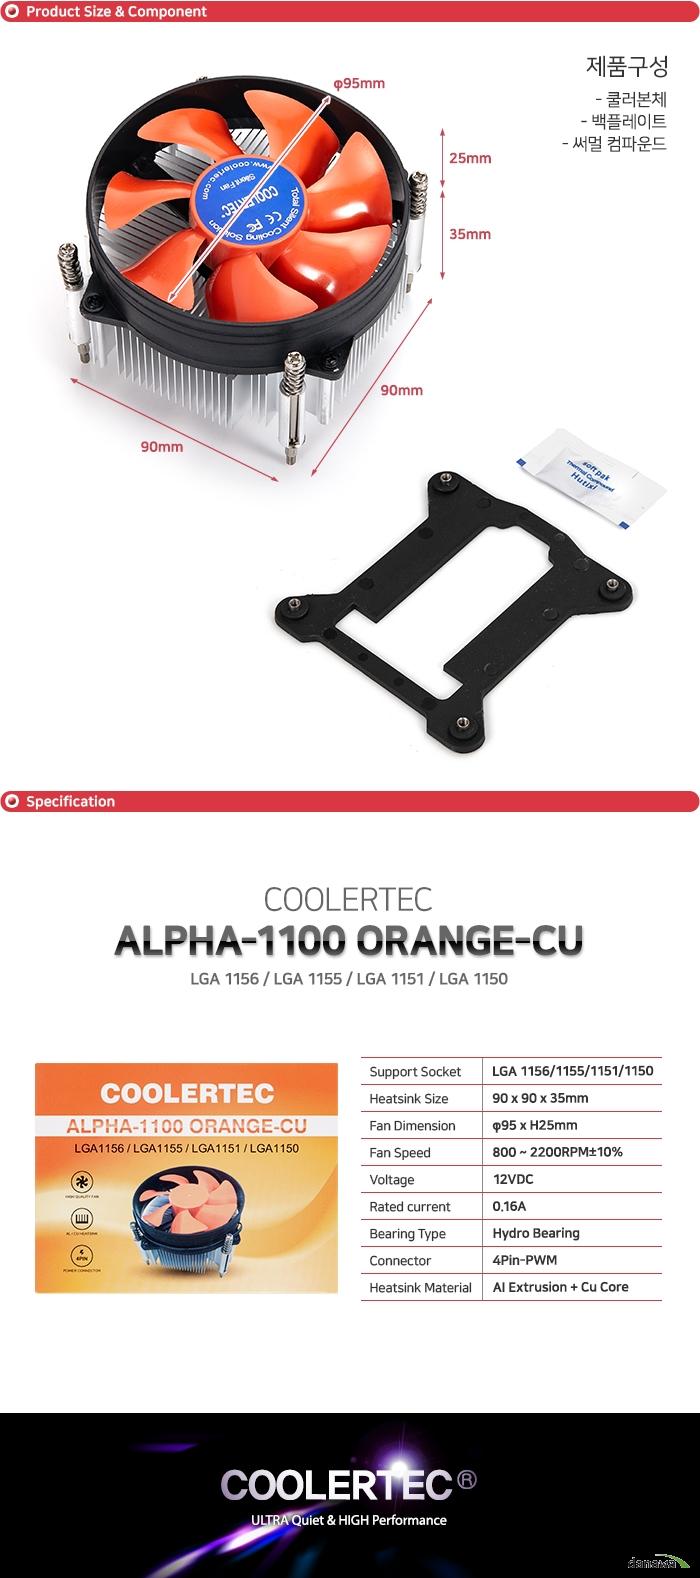 COOLERTEC ALPHA-1100 ORANGE-CU